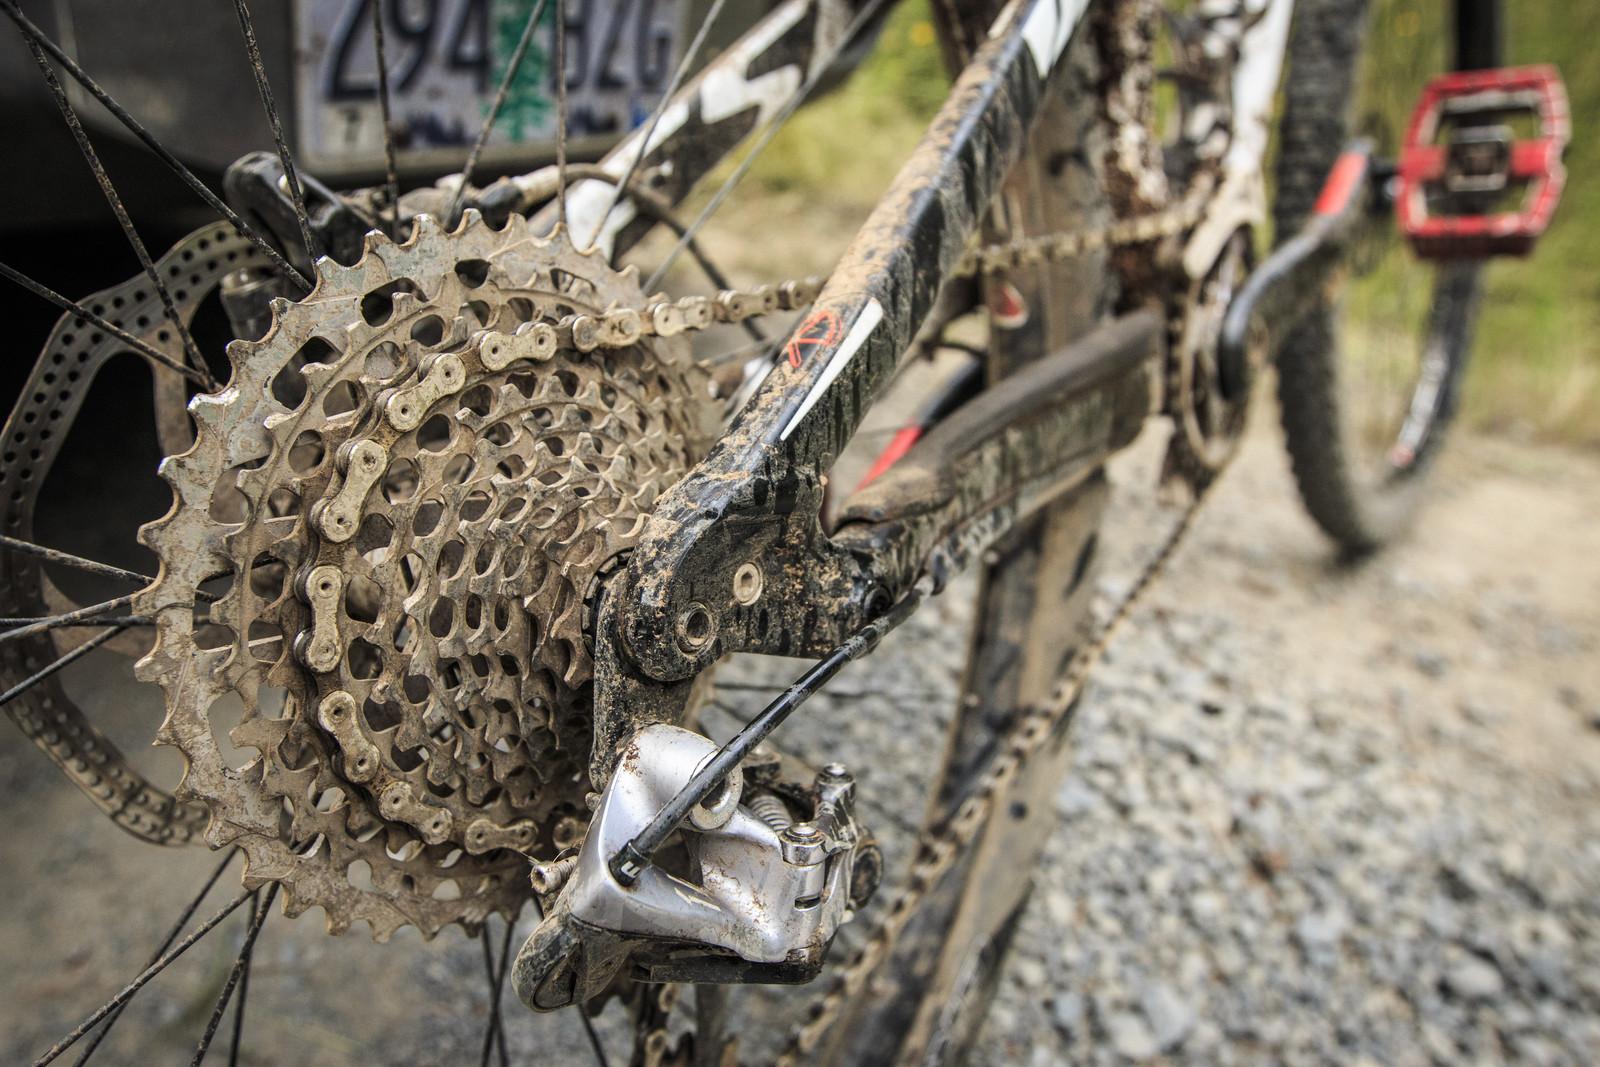 SRAM XX1 on Kirt Voreis' Specialized Enduro 29 - WINNING BIKE: Kirt Voreis' Specialized Enduro 29 - Mountain Biking Pictures - Vital MTB